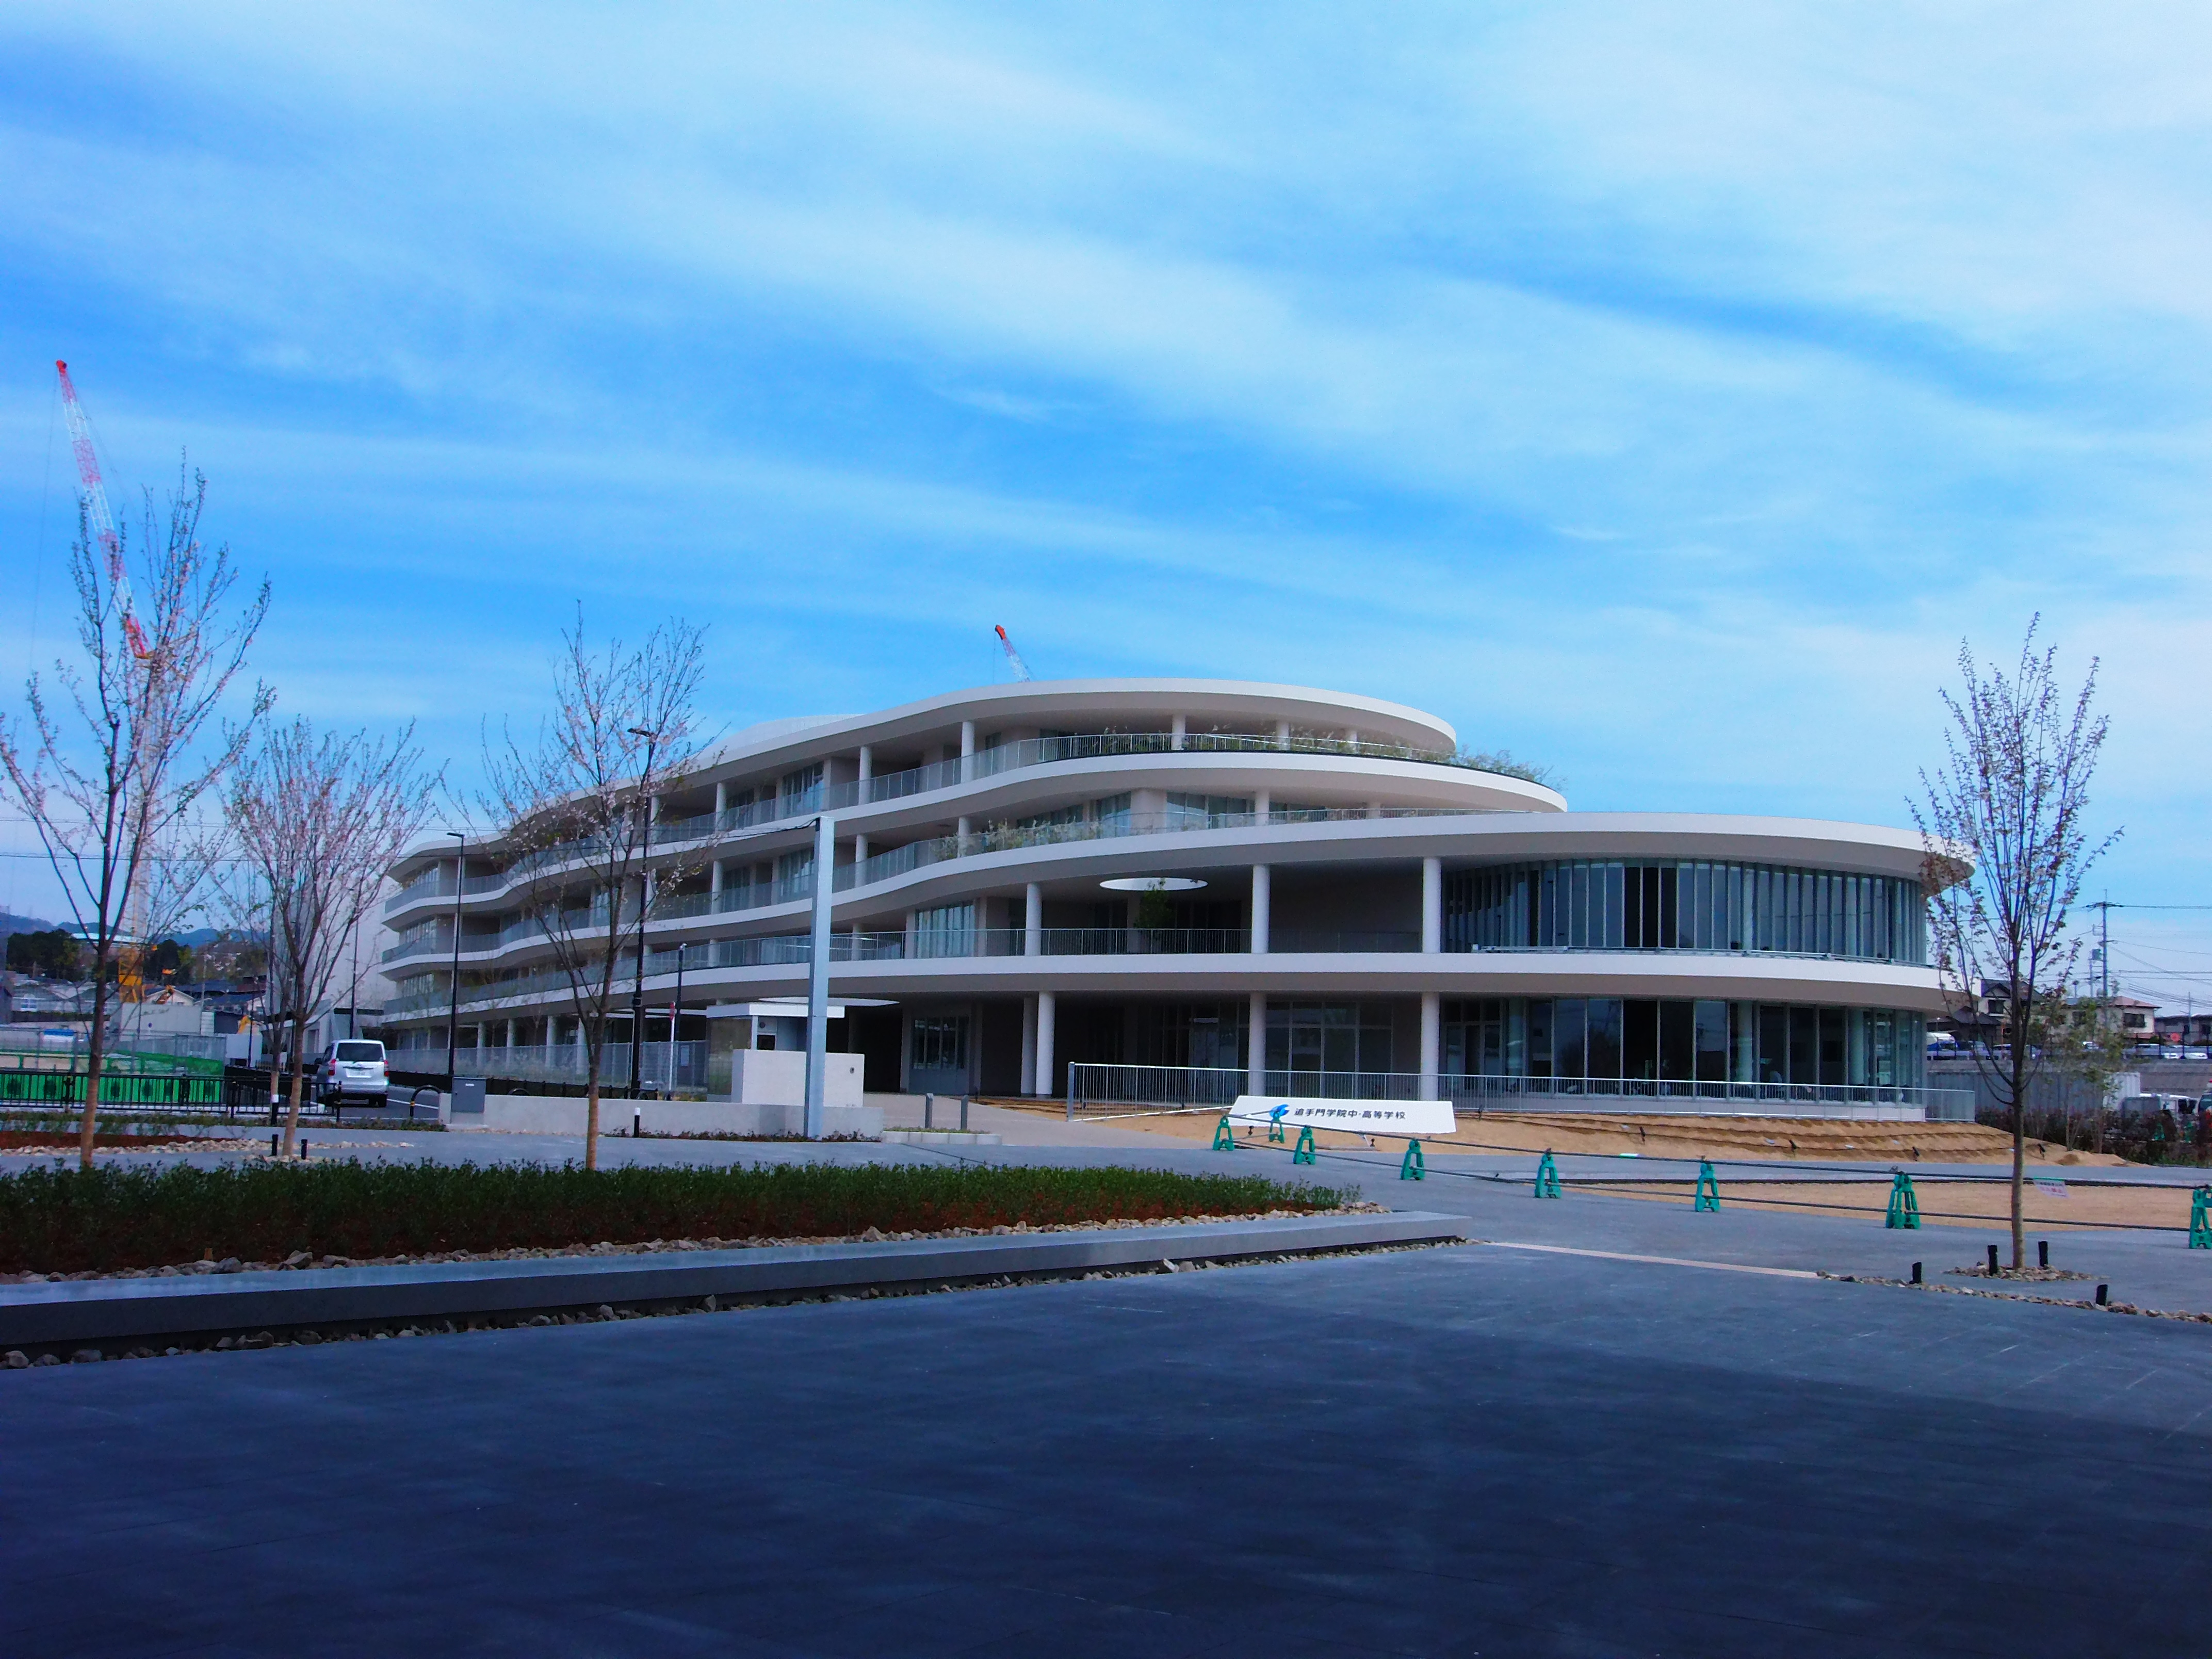 Images of 日本の看護に関する学科設置高等学校一覧